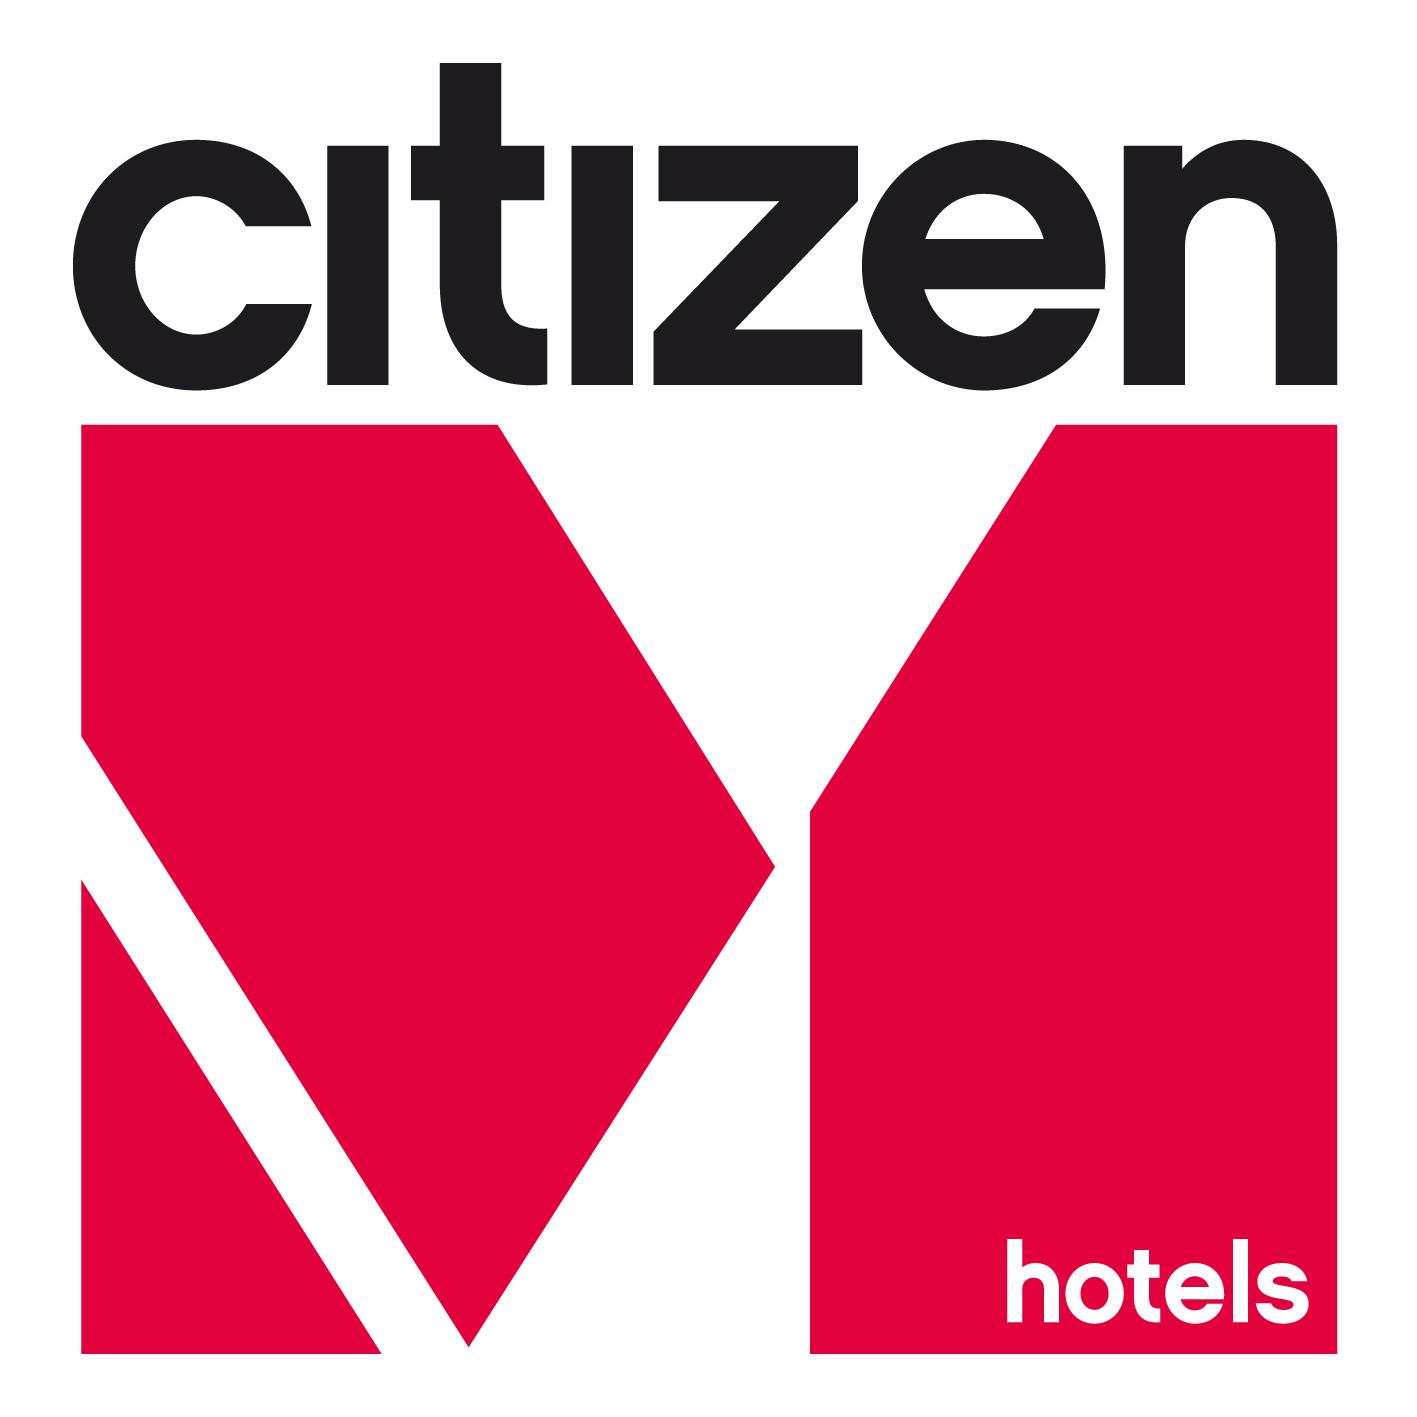 cm-logo-hotels2